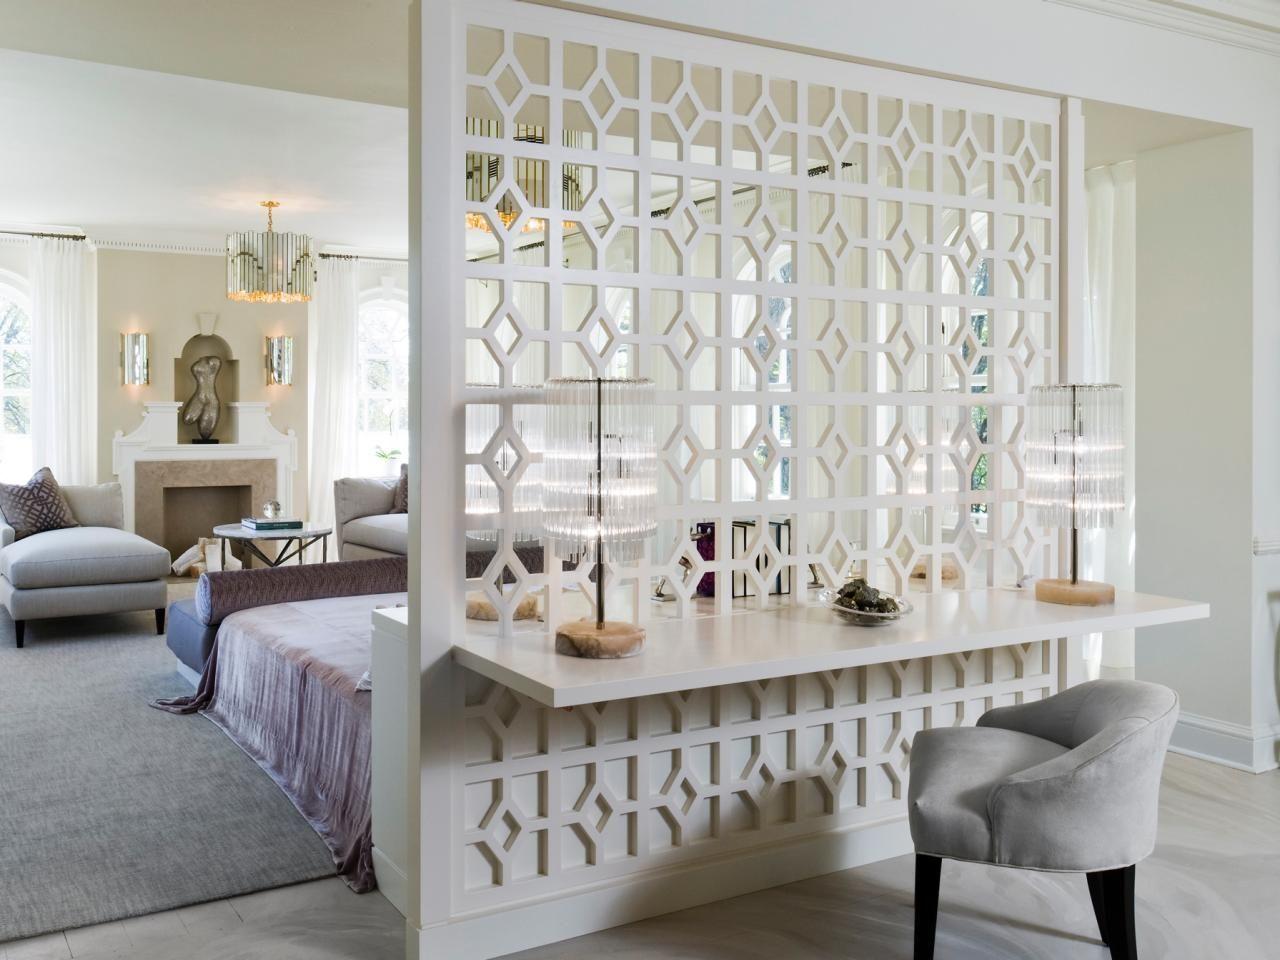 Bamboo room divider drawer dividers room divider repurpose patio